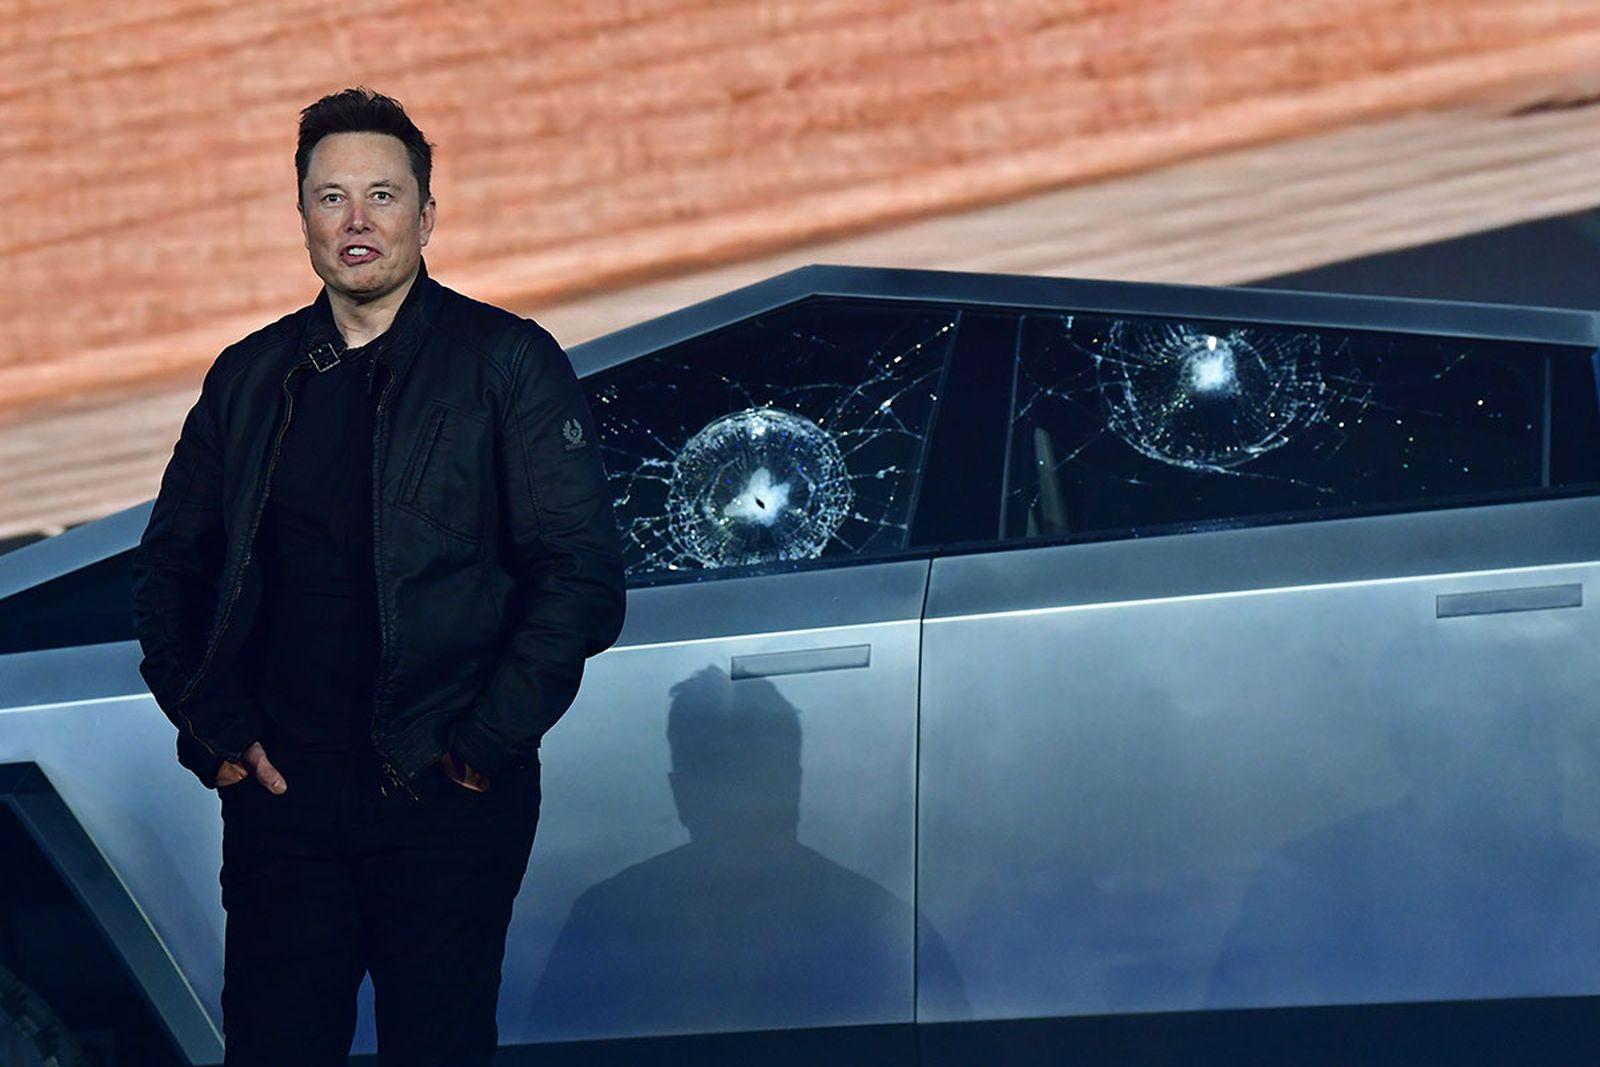 Elon Musk after the Tesla Cybertruck's windows smashed